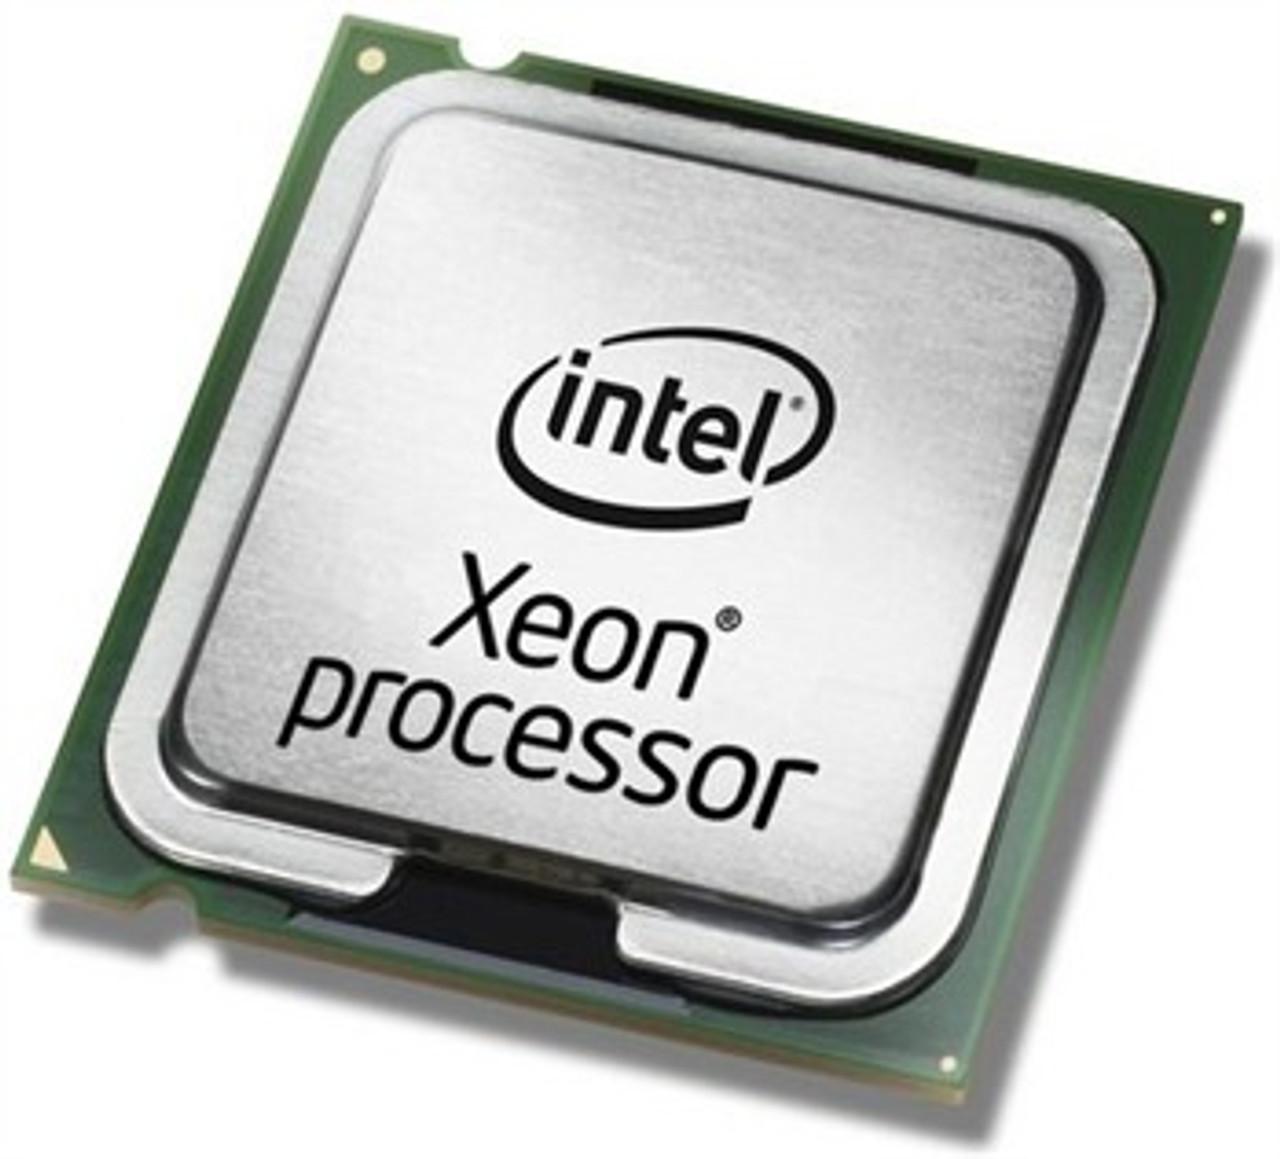 Intel Xeon Quad Core W5590 AT80602000753AA  SLBGE 3.33 GHz 8MB LGA1366 Processor